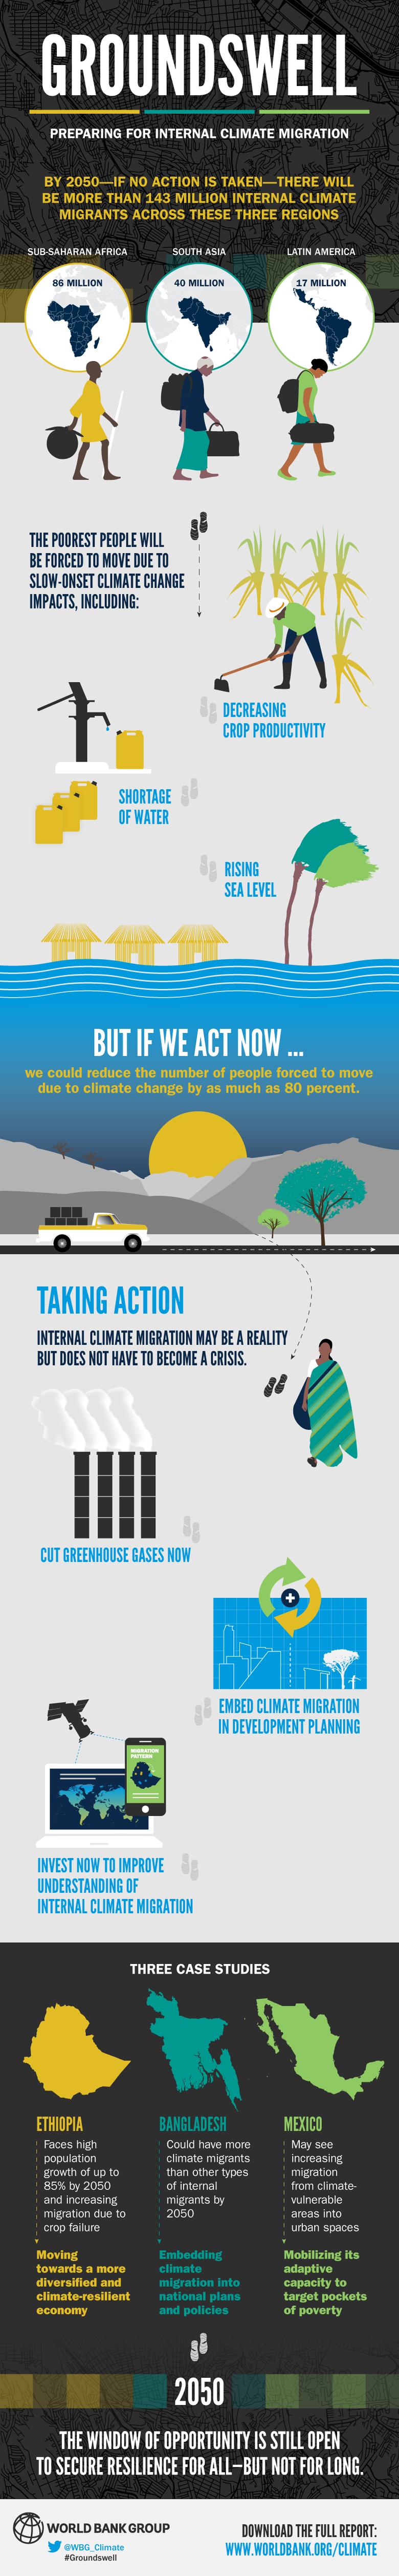 ClimateMigration_English1.png